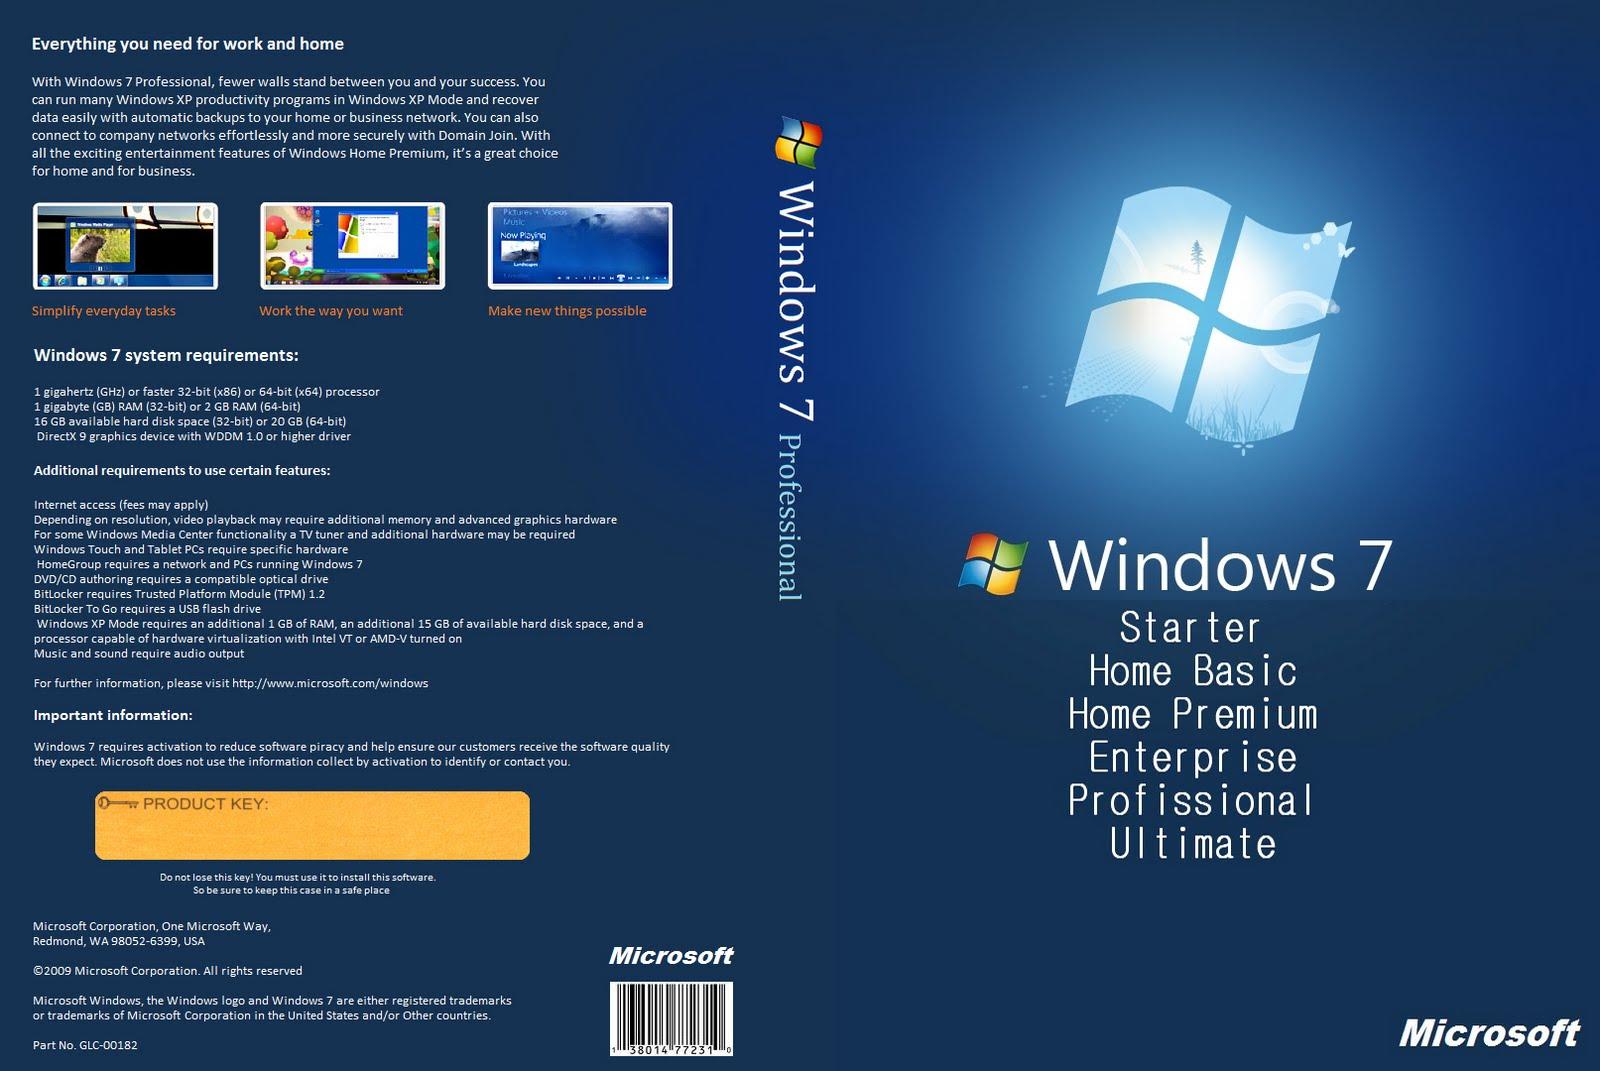 service pack 1 windows 7 home premium 64 bit download